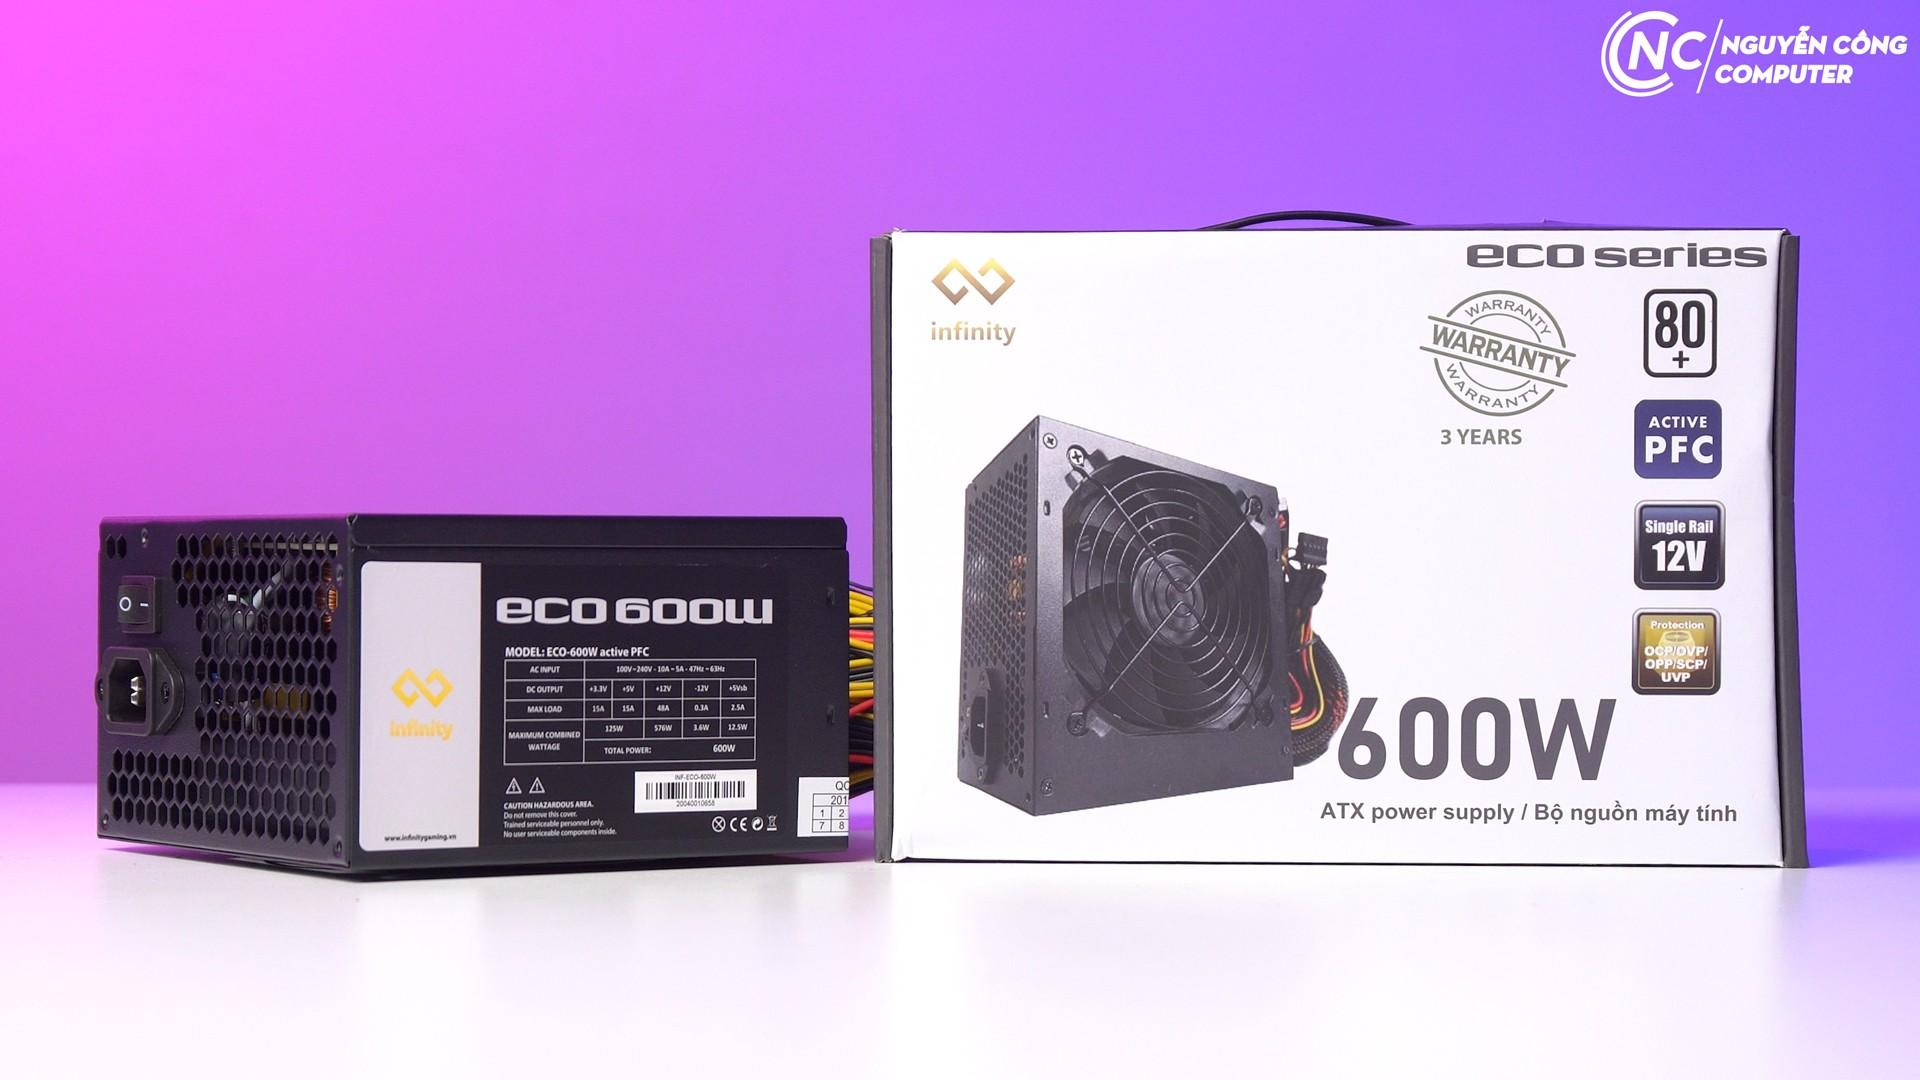 bo-pc-amd-ryzen-5-3600x-ram-16g-bus-3200-gtx-1660-6gb-nc5